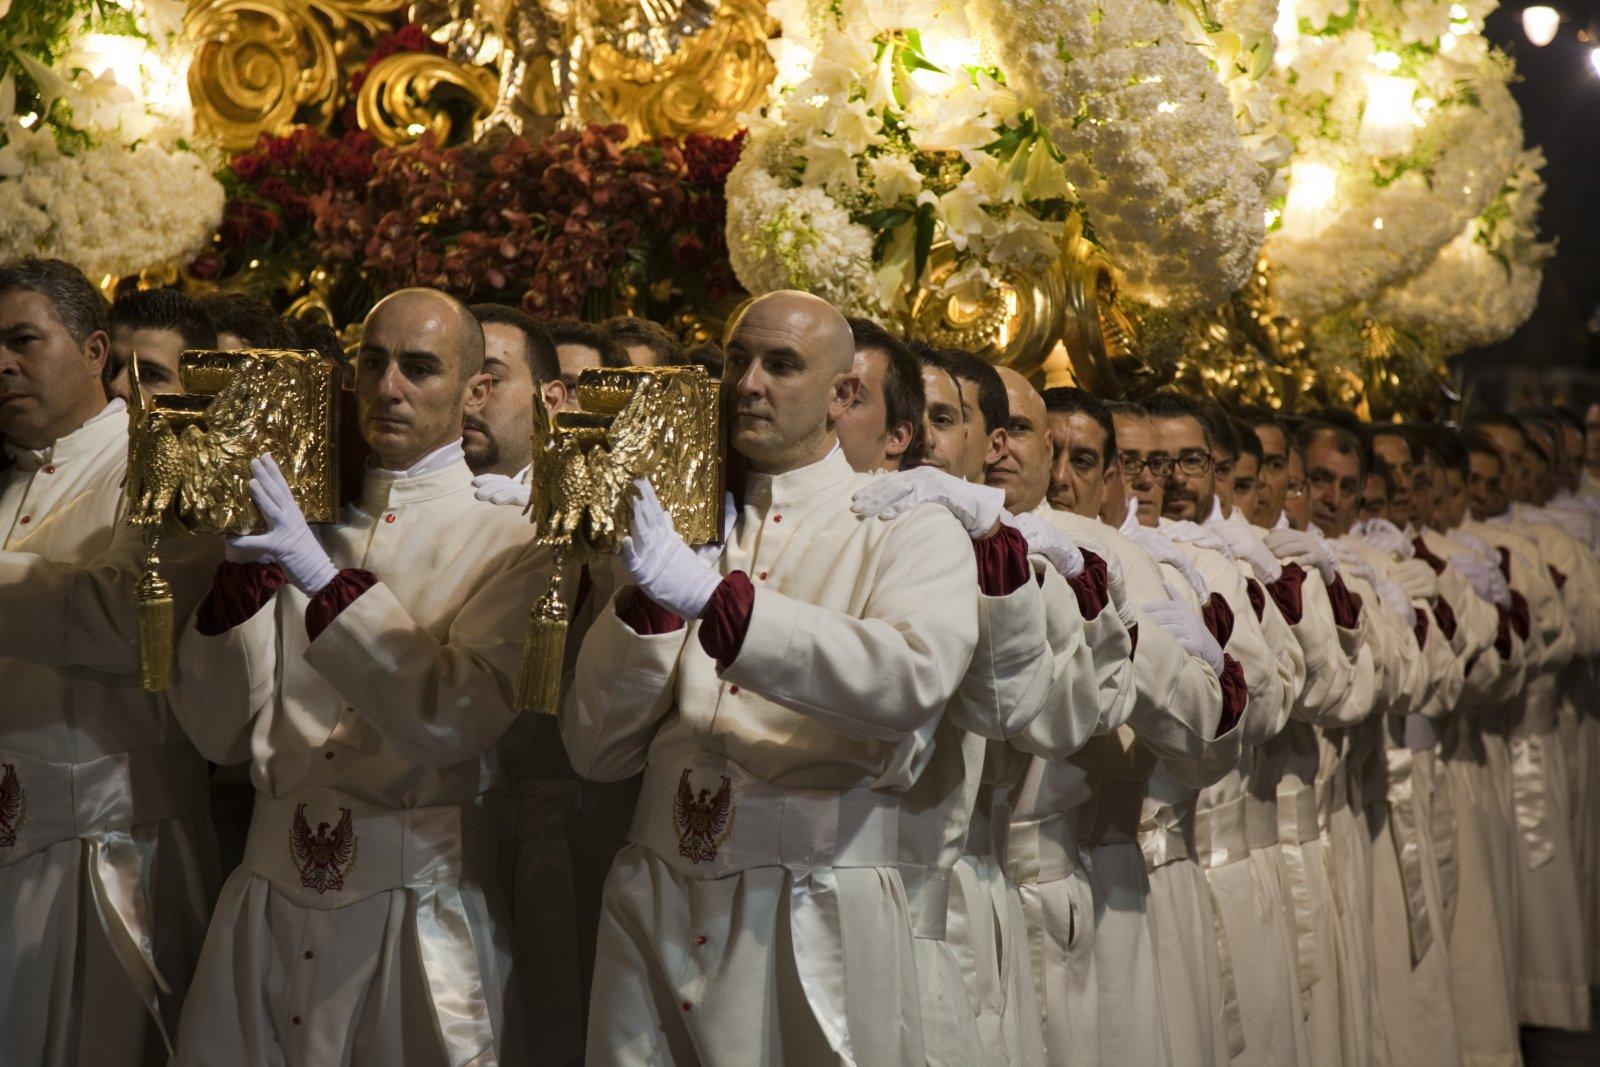 A Trono during the Semana Santa processions in Cartagena, Spain